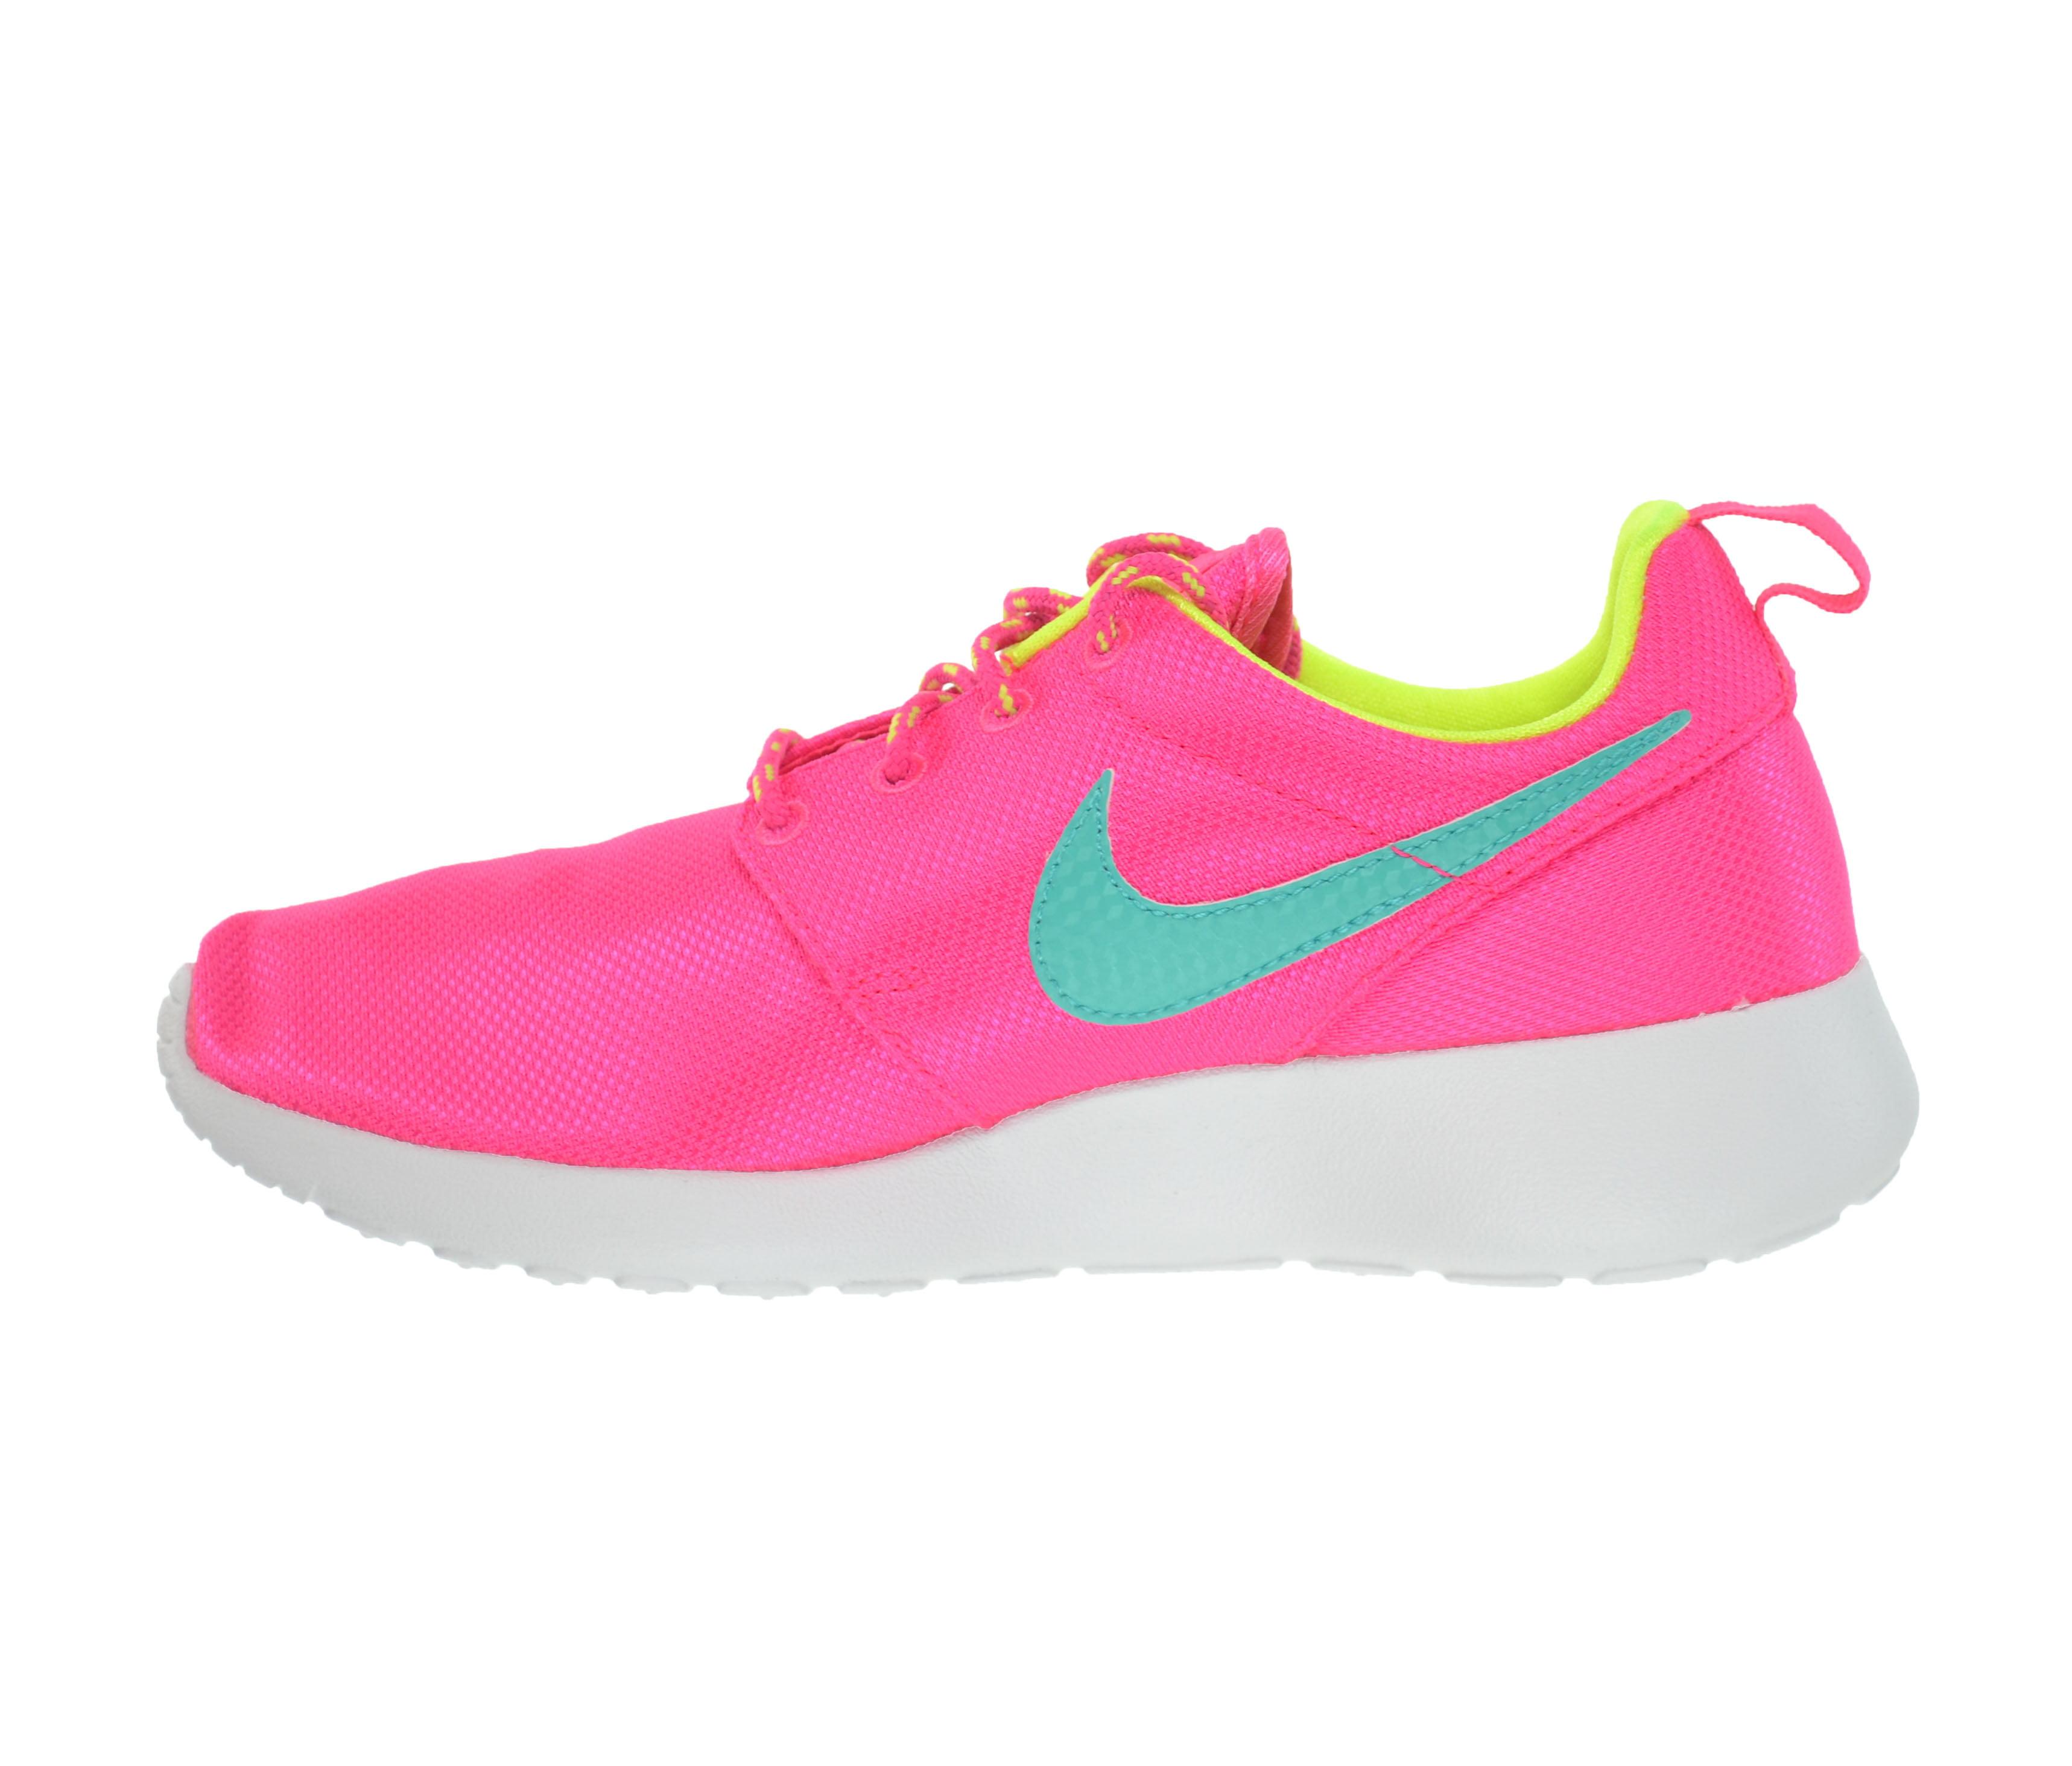 Nike Rosherun Big Kids Shoes Hyper Pink/Jade-Volt-White/Blue 599729-605 -  Walmart.com